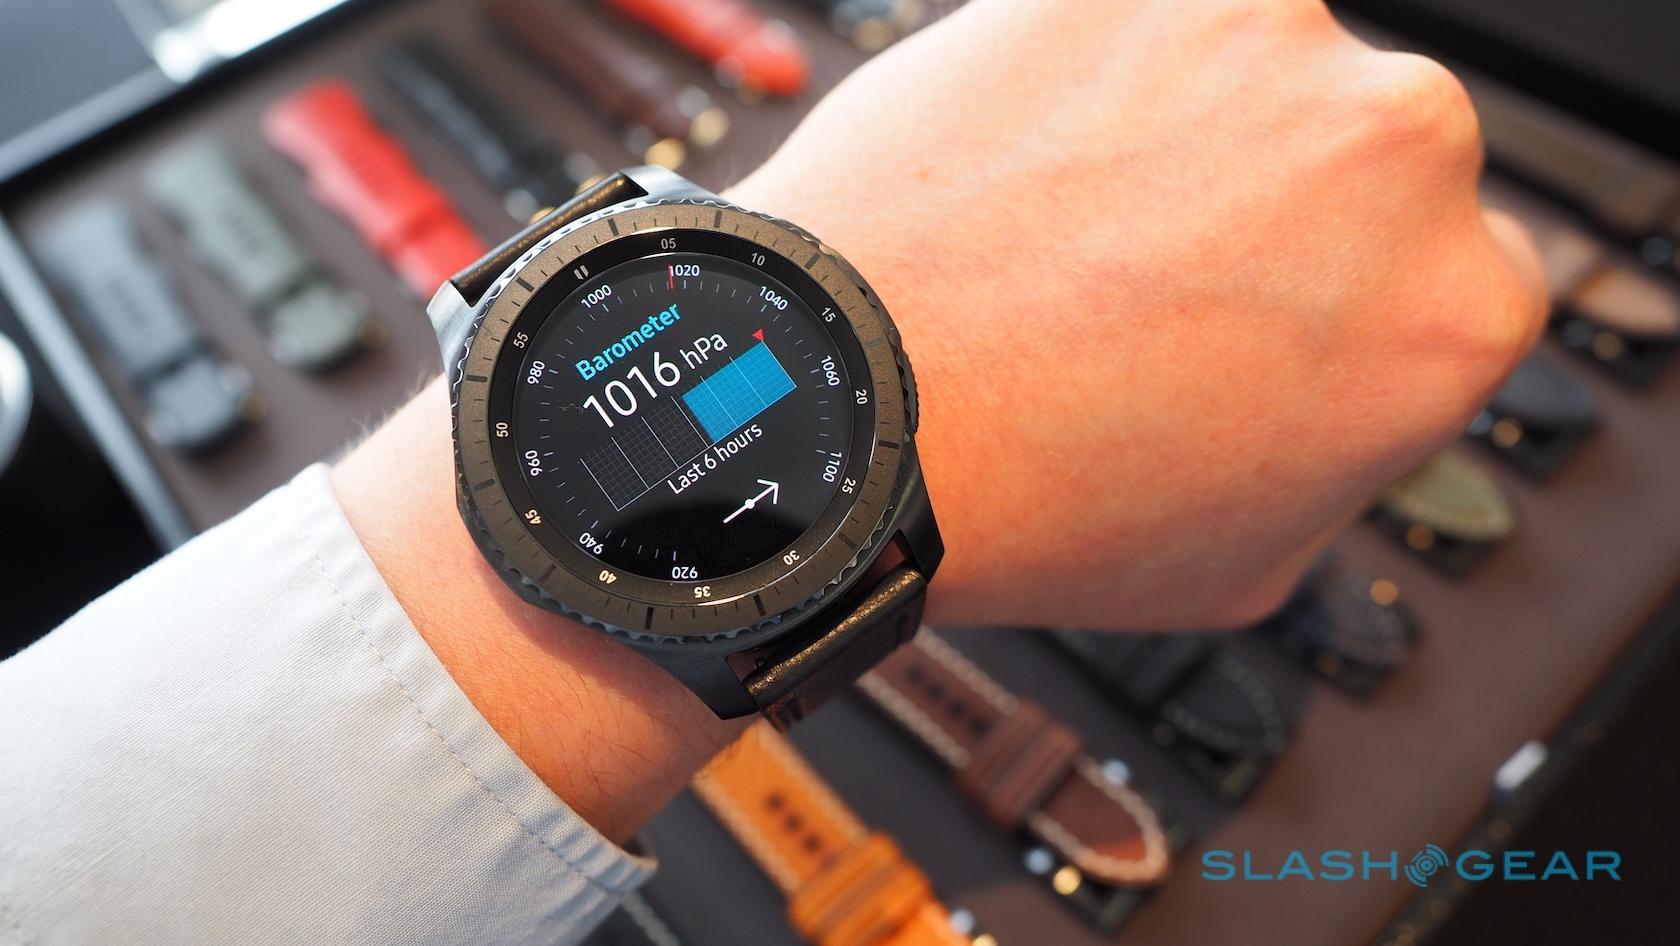 Samsung Gear S3 hands-on: Samsung Pay, LTE, rugged